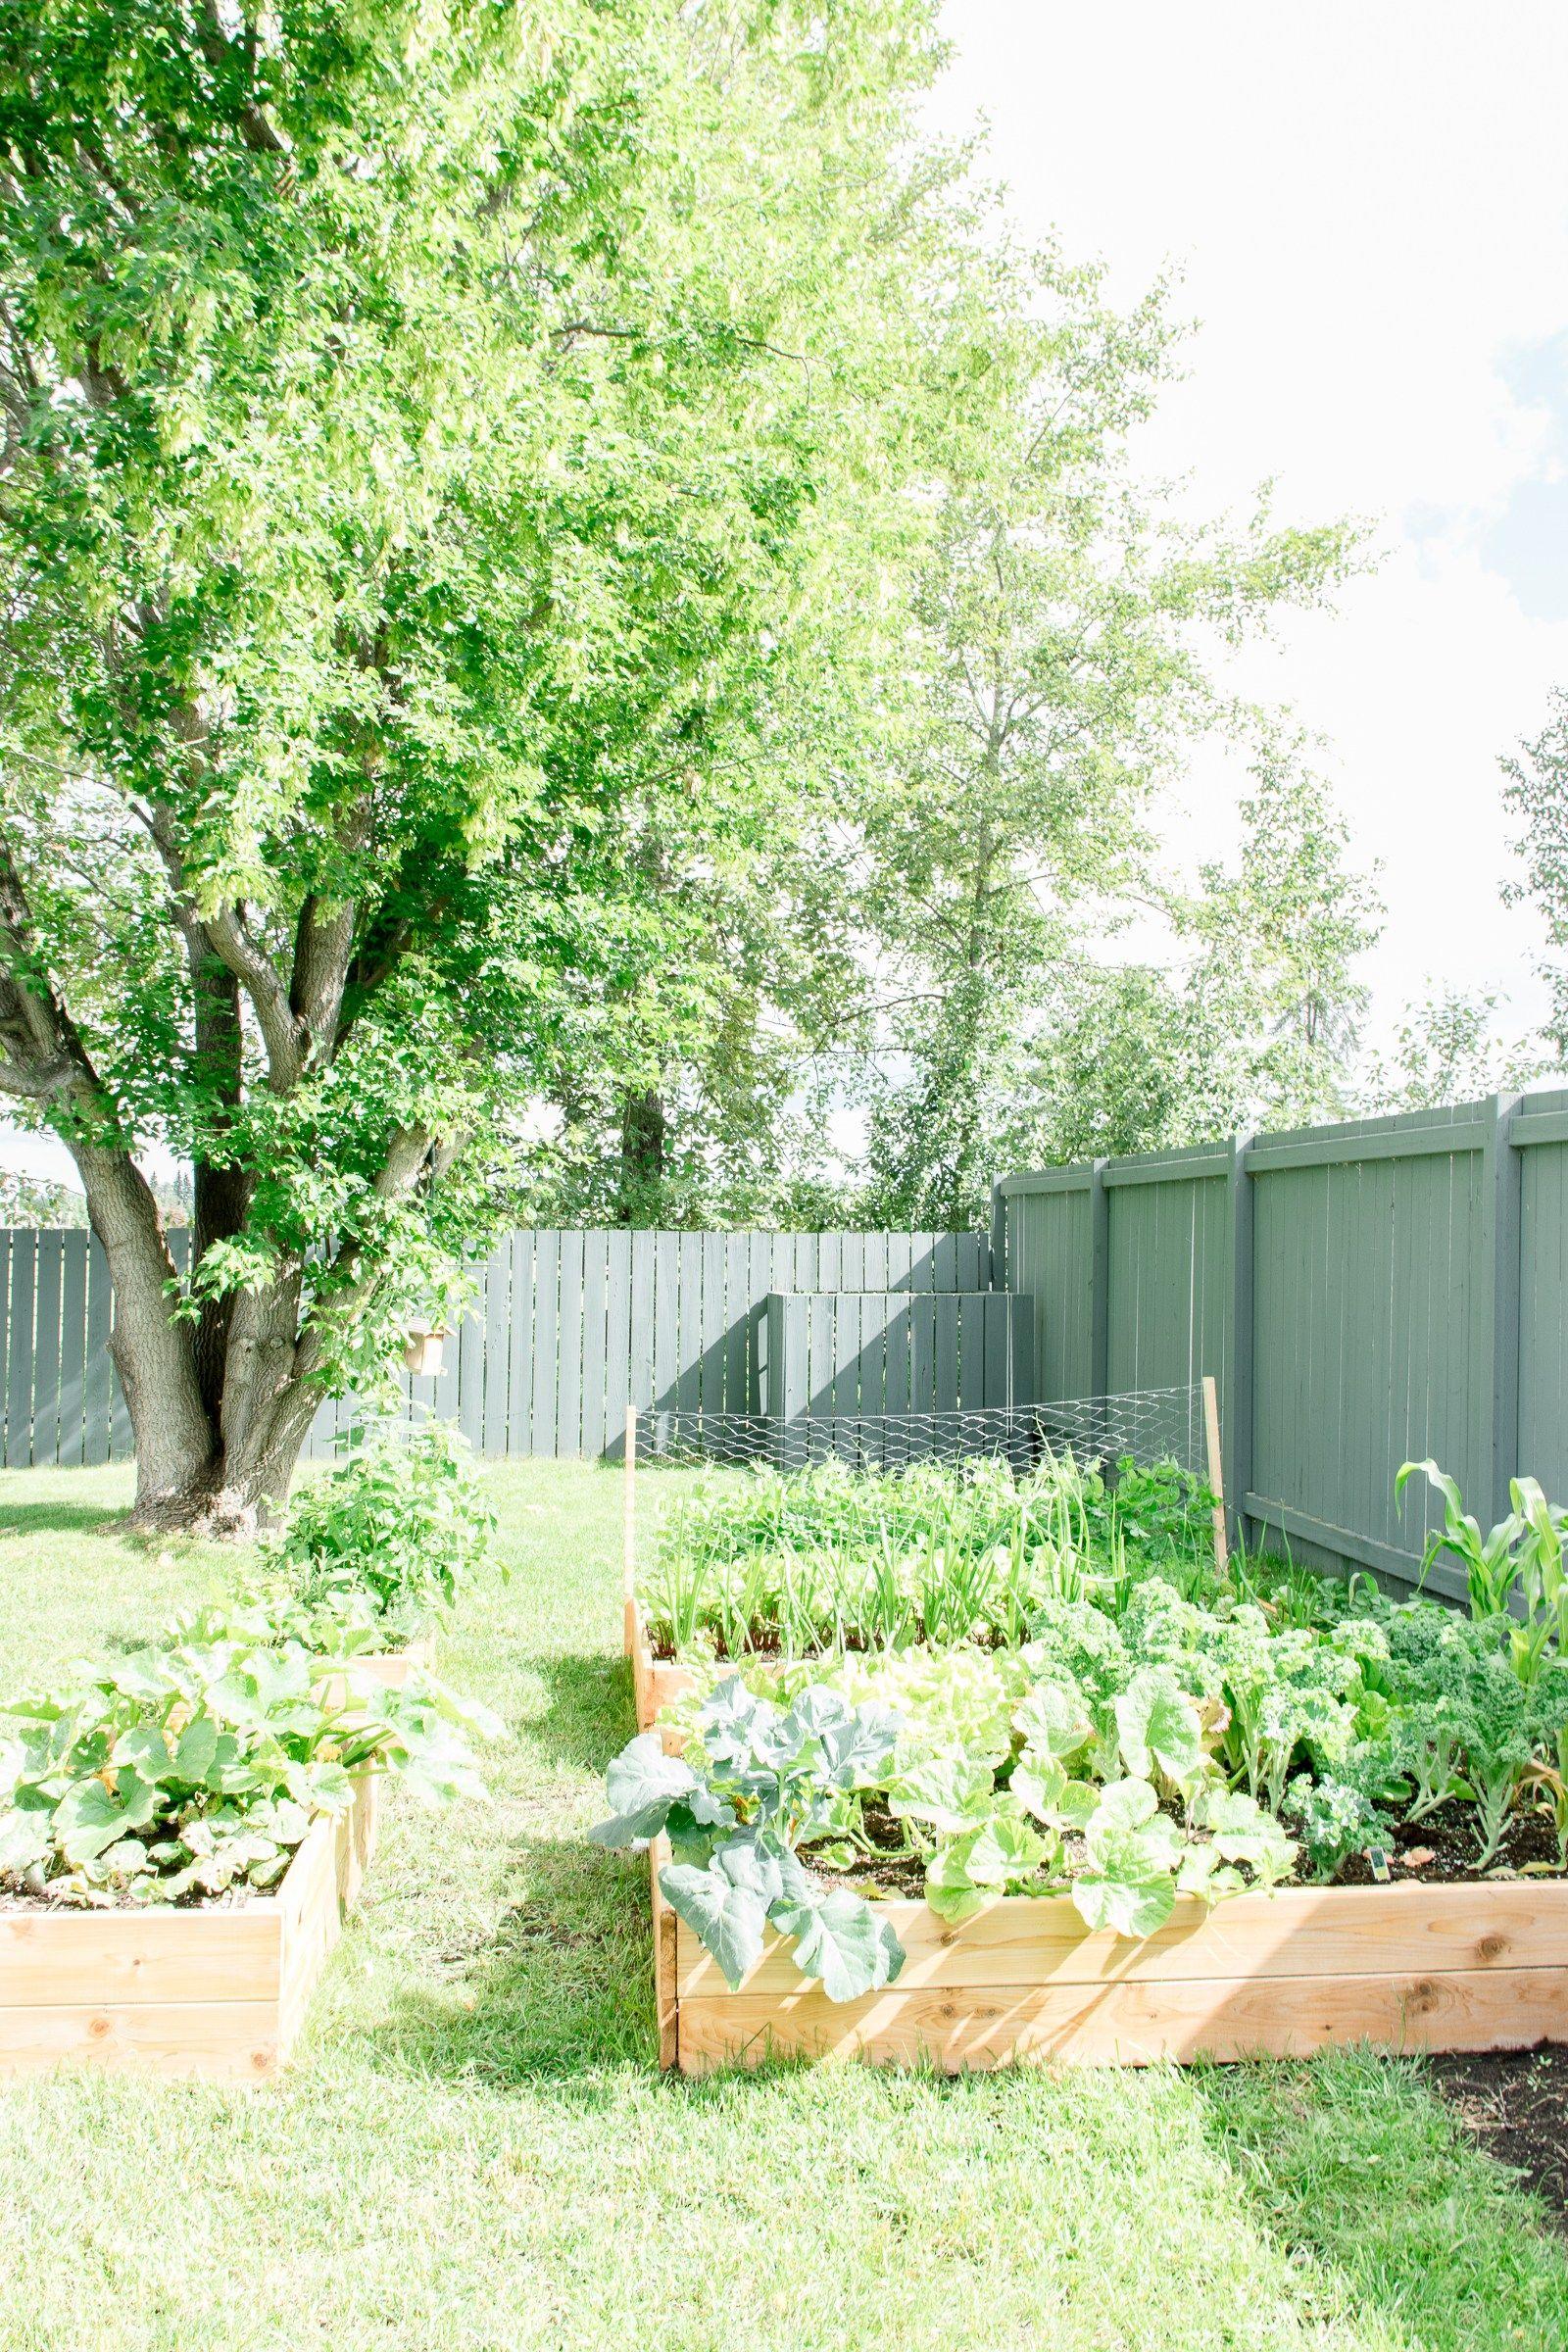 How to build your own diy raised garden bed garden life